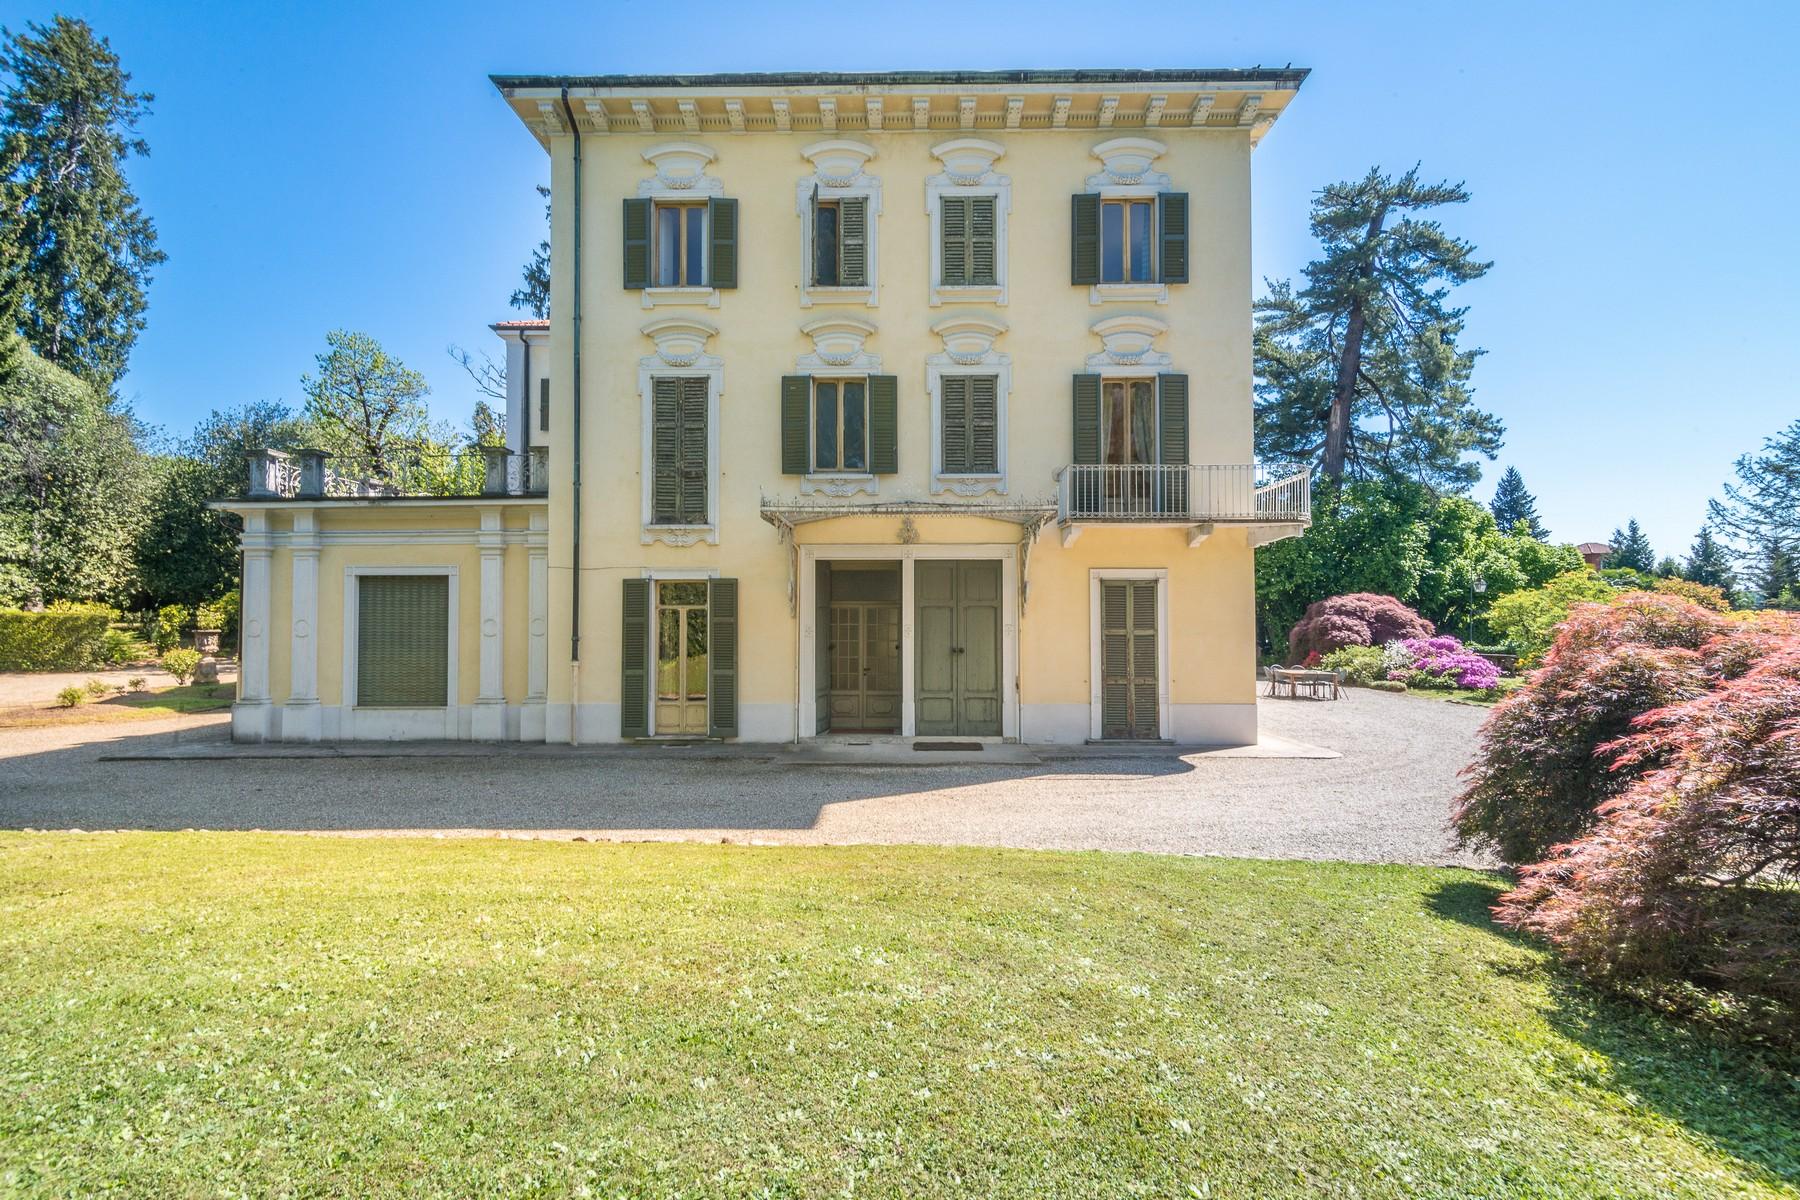 Villa in Vendita a Varese: 5 locali, 1500 mq - Foto 4